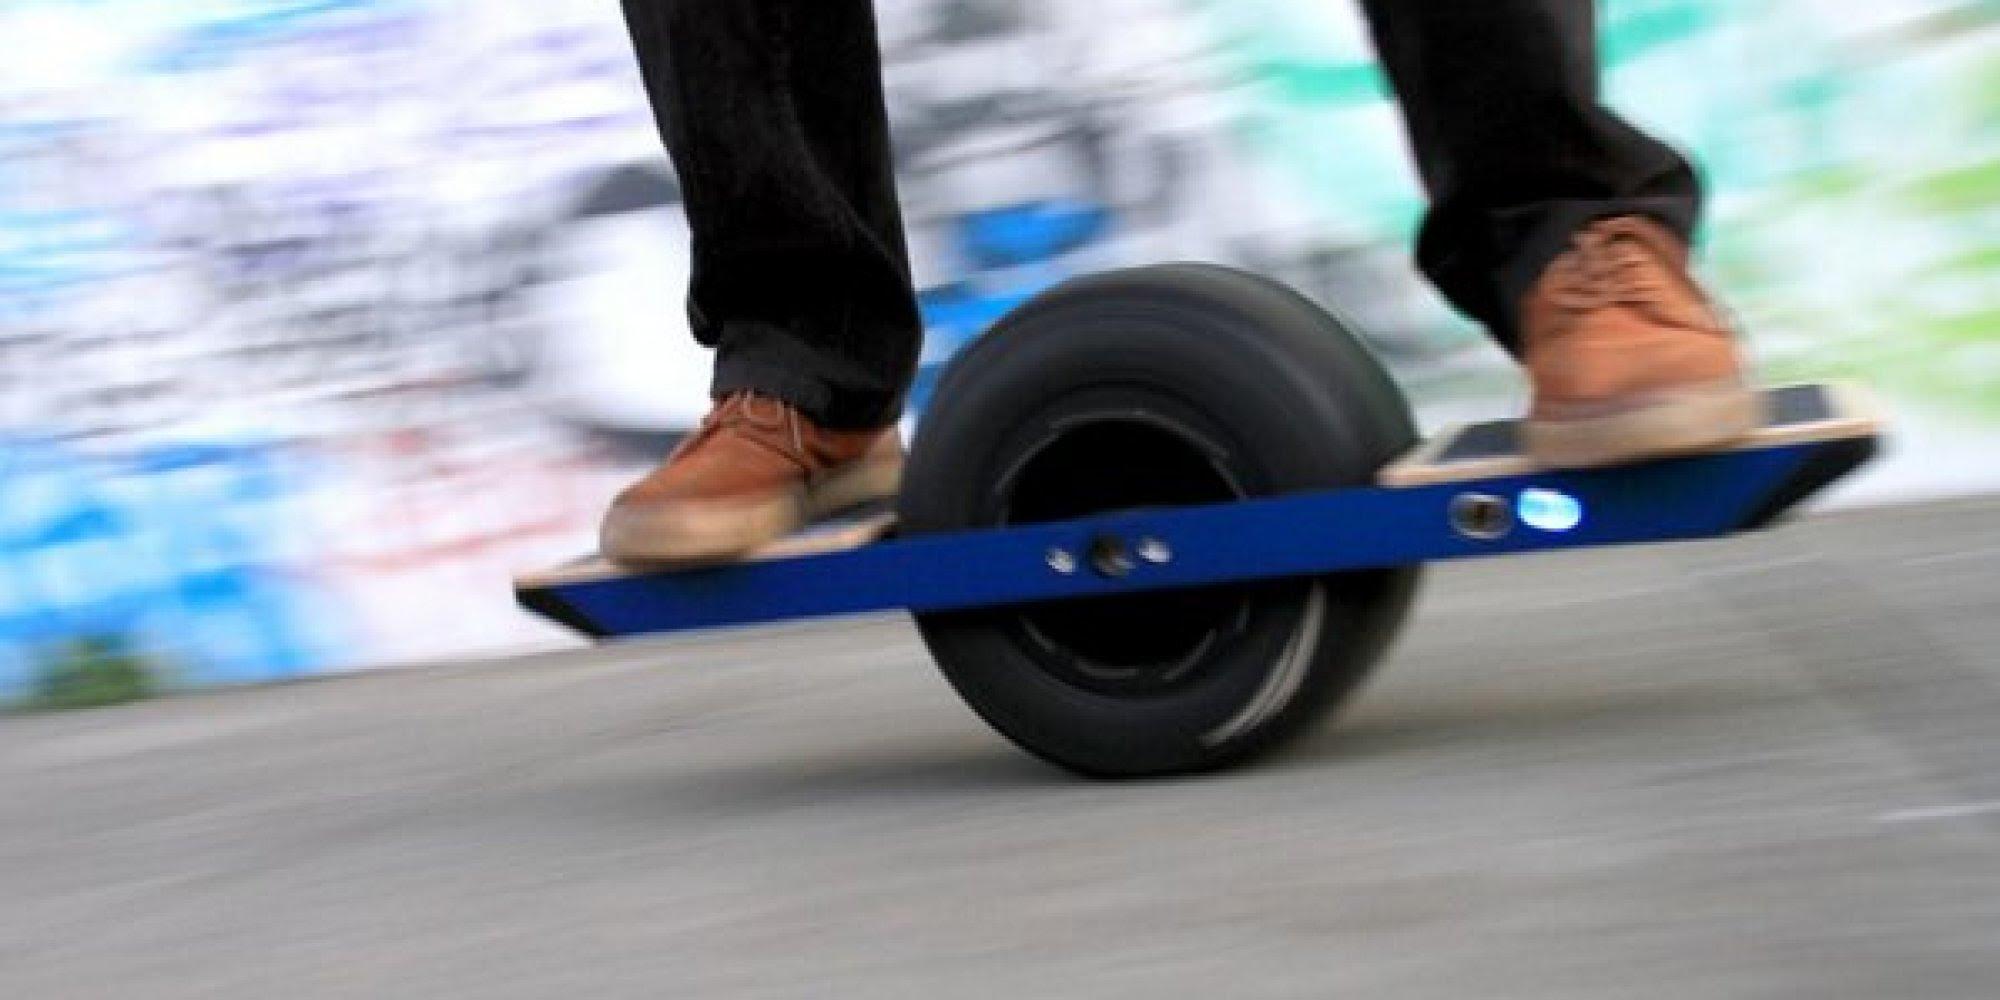 \u002639;Onewheel\u002639; Electric Skateboard Is A Flawed Take On The Future HANDS ON  HuffPost UK